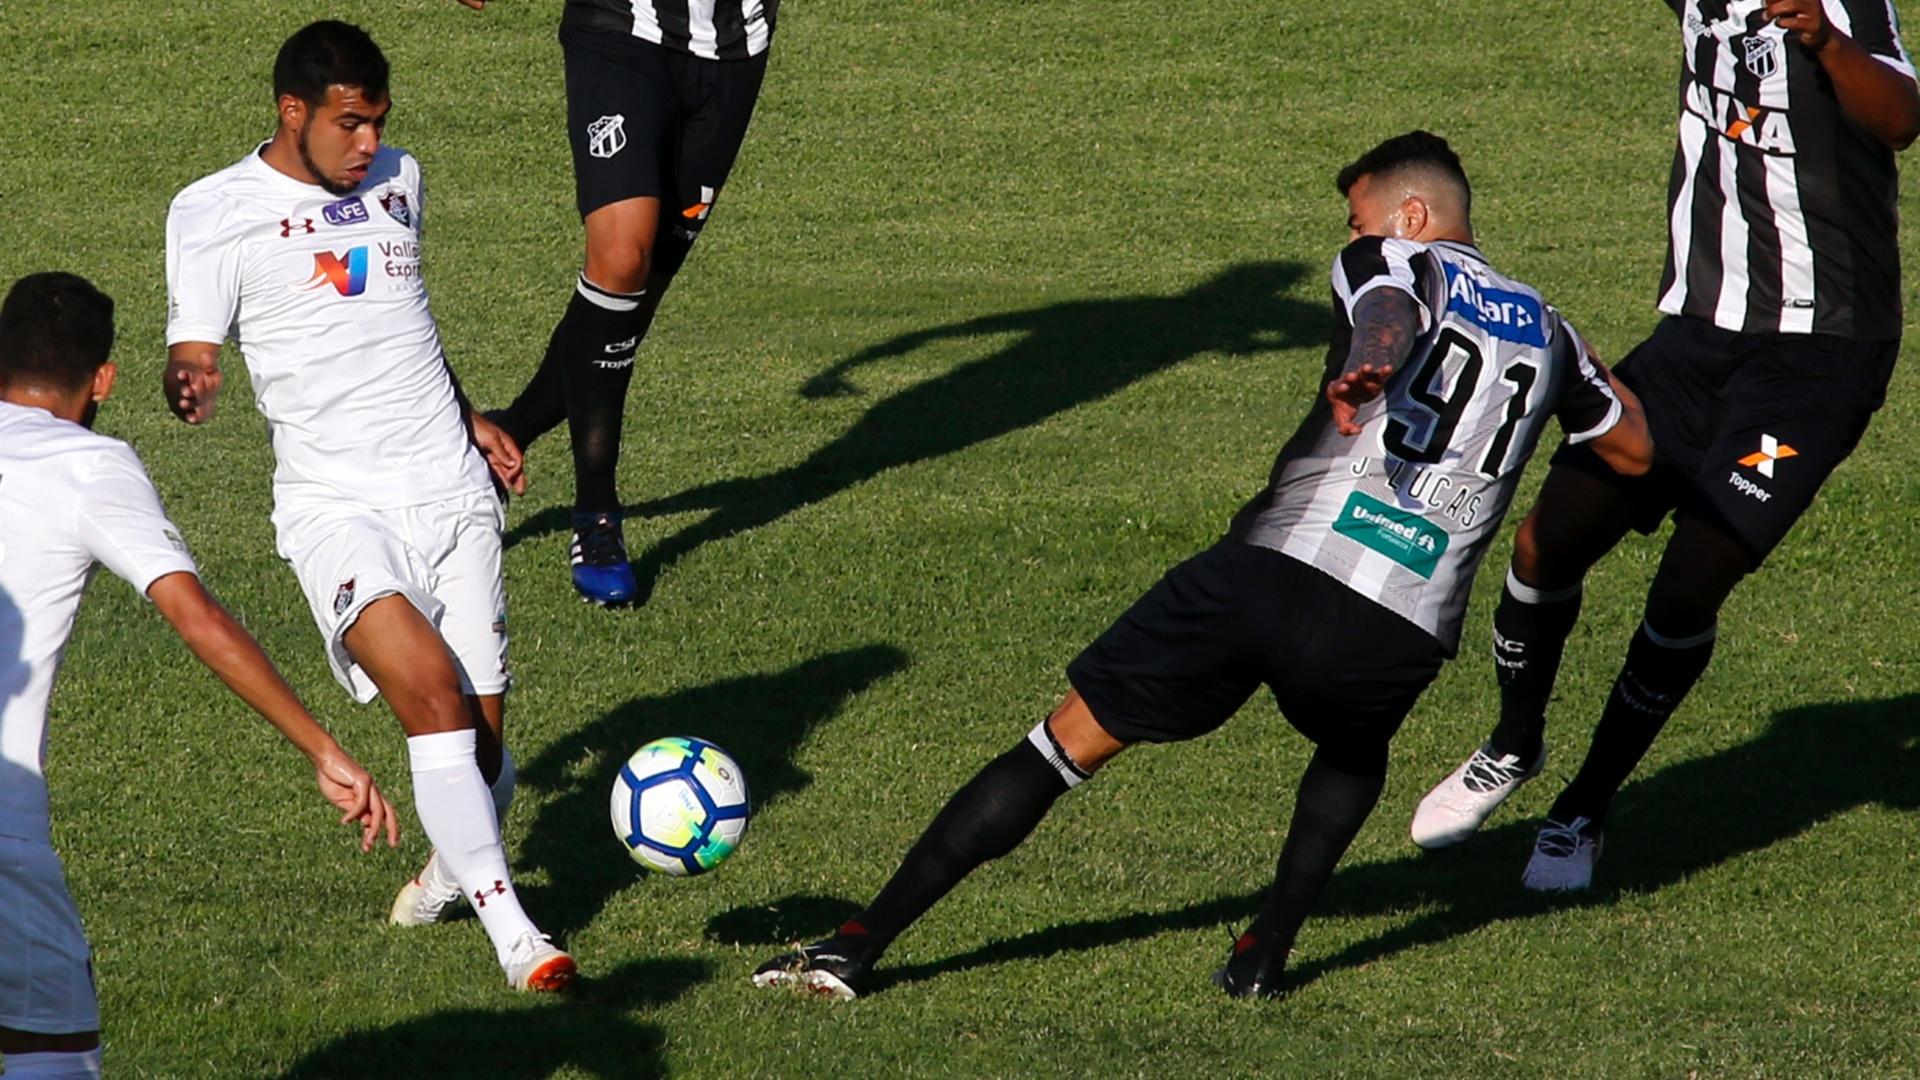 Sornoza é marcado por João Lucas no jogo entre Ceará e Fluminense